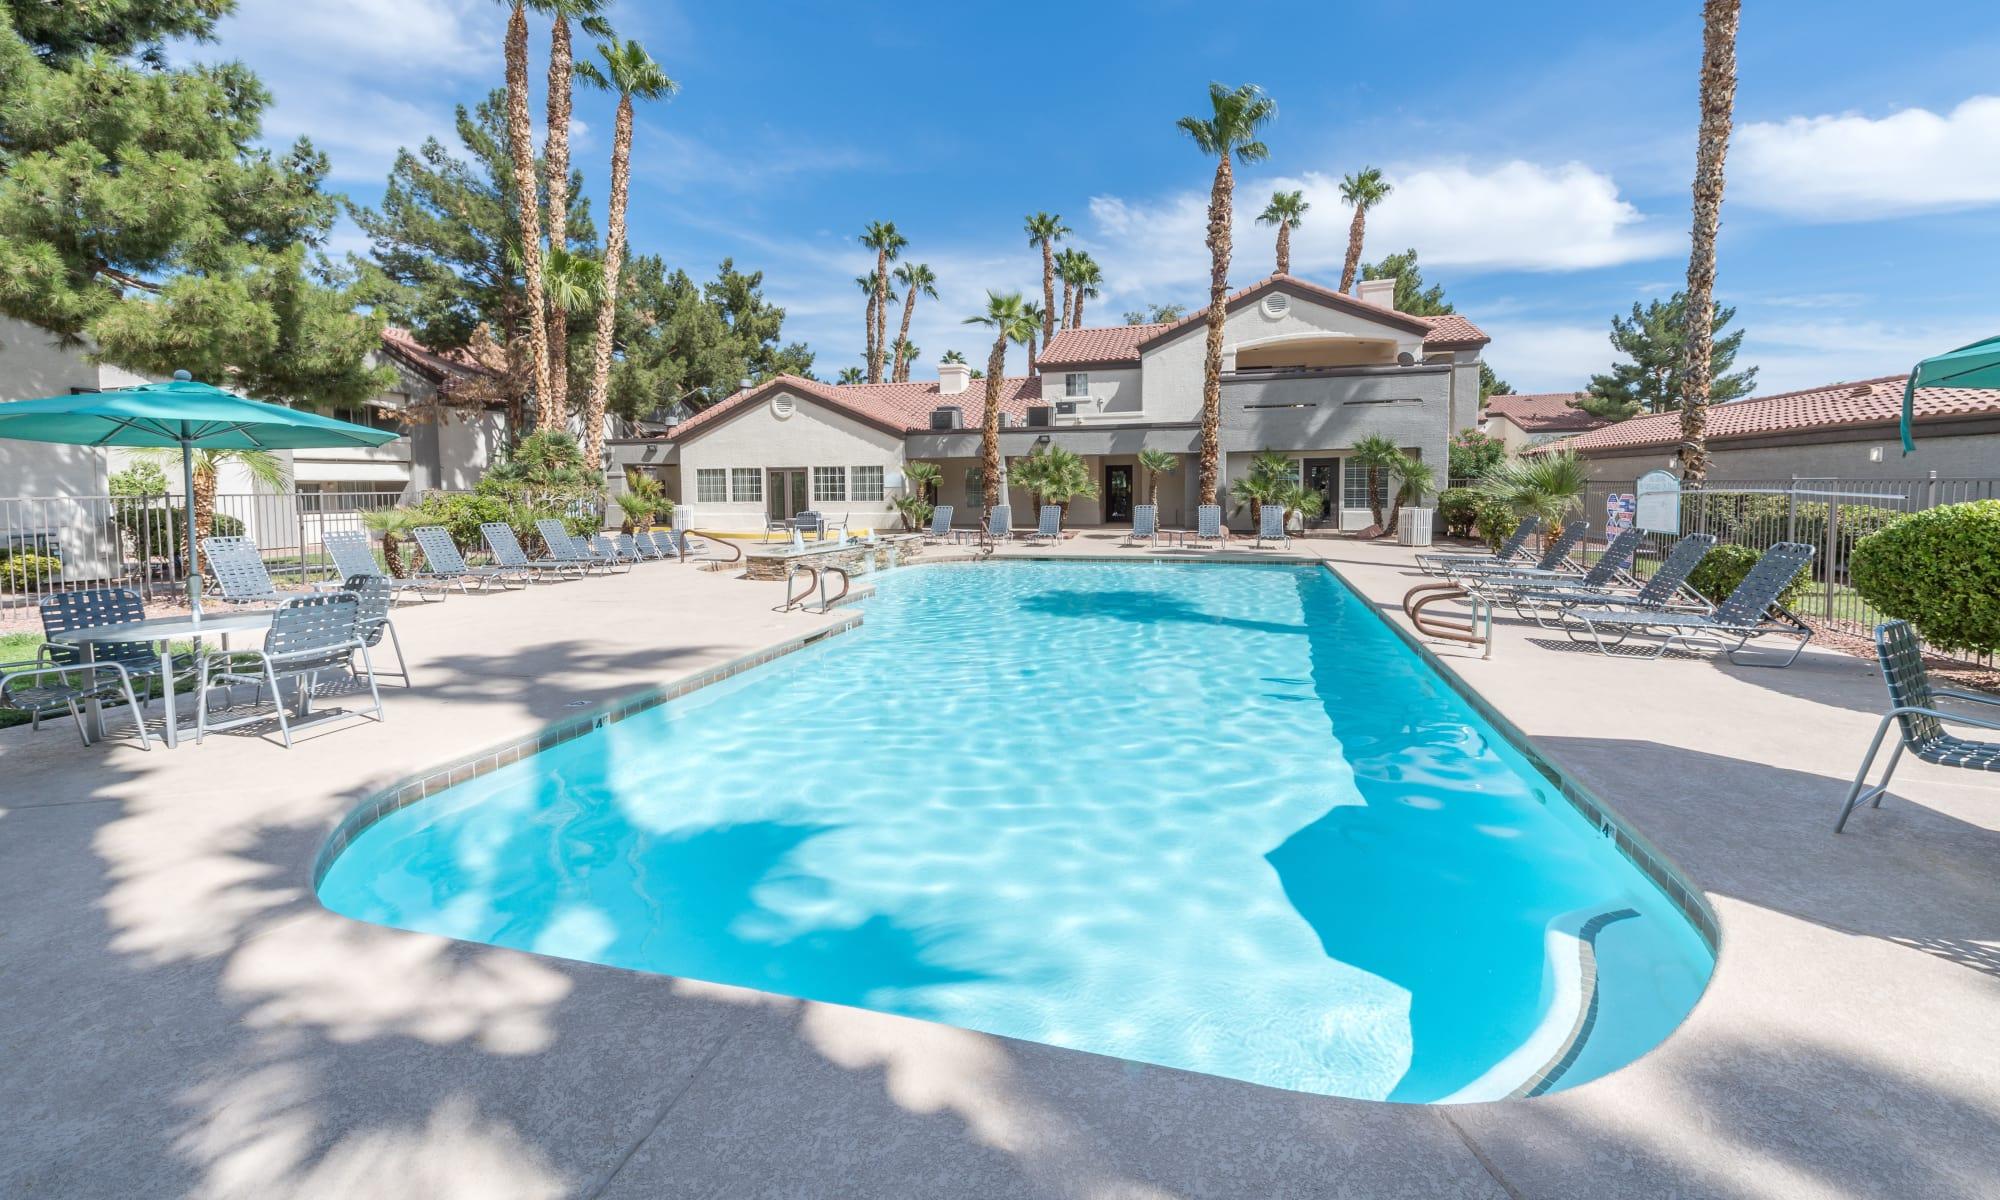 Suggestions to help improve 3055 Las Vegas in Las Vegas, Nevada